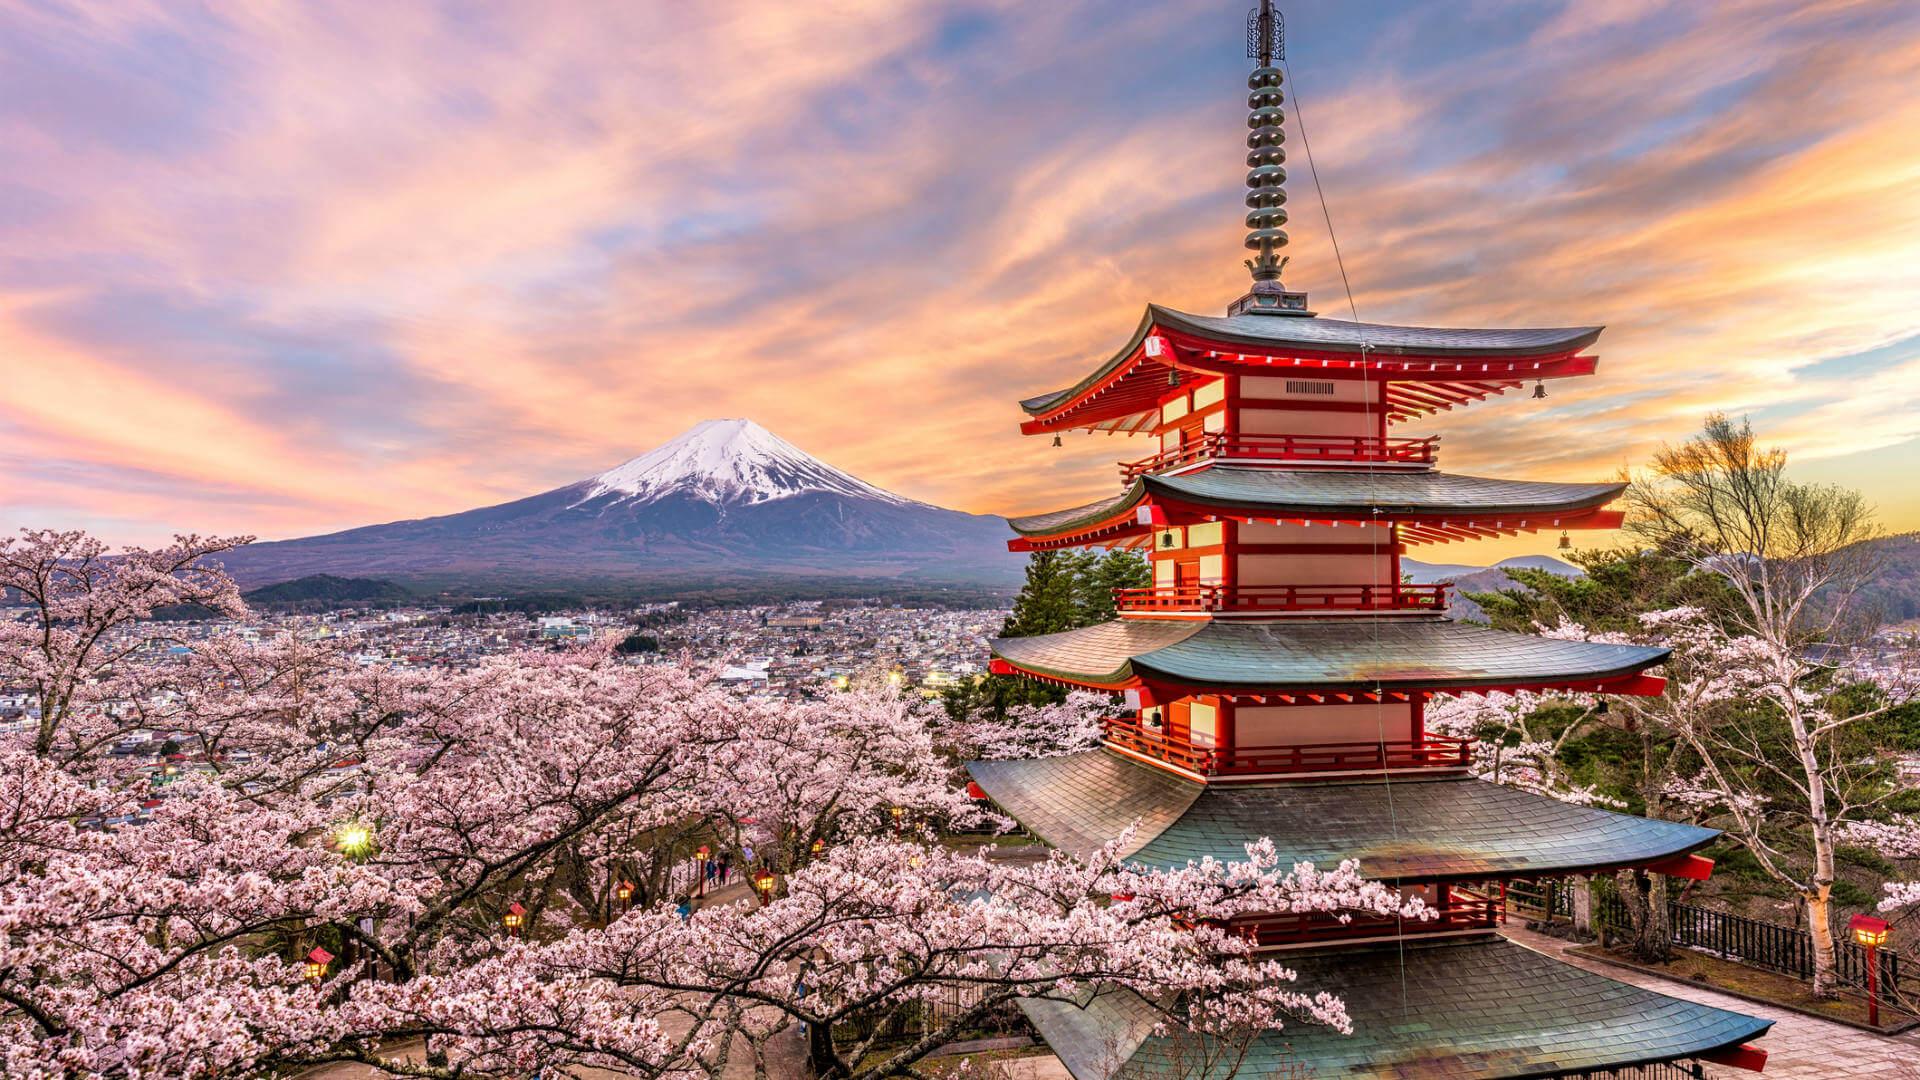 viaje a japon monte fuji